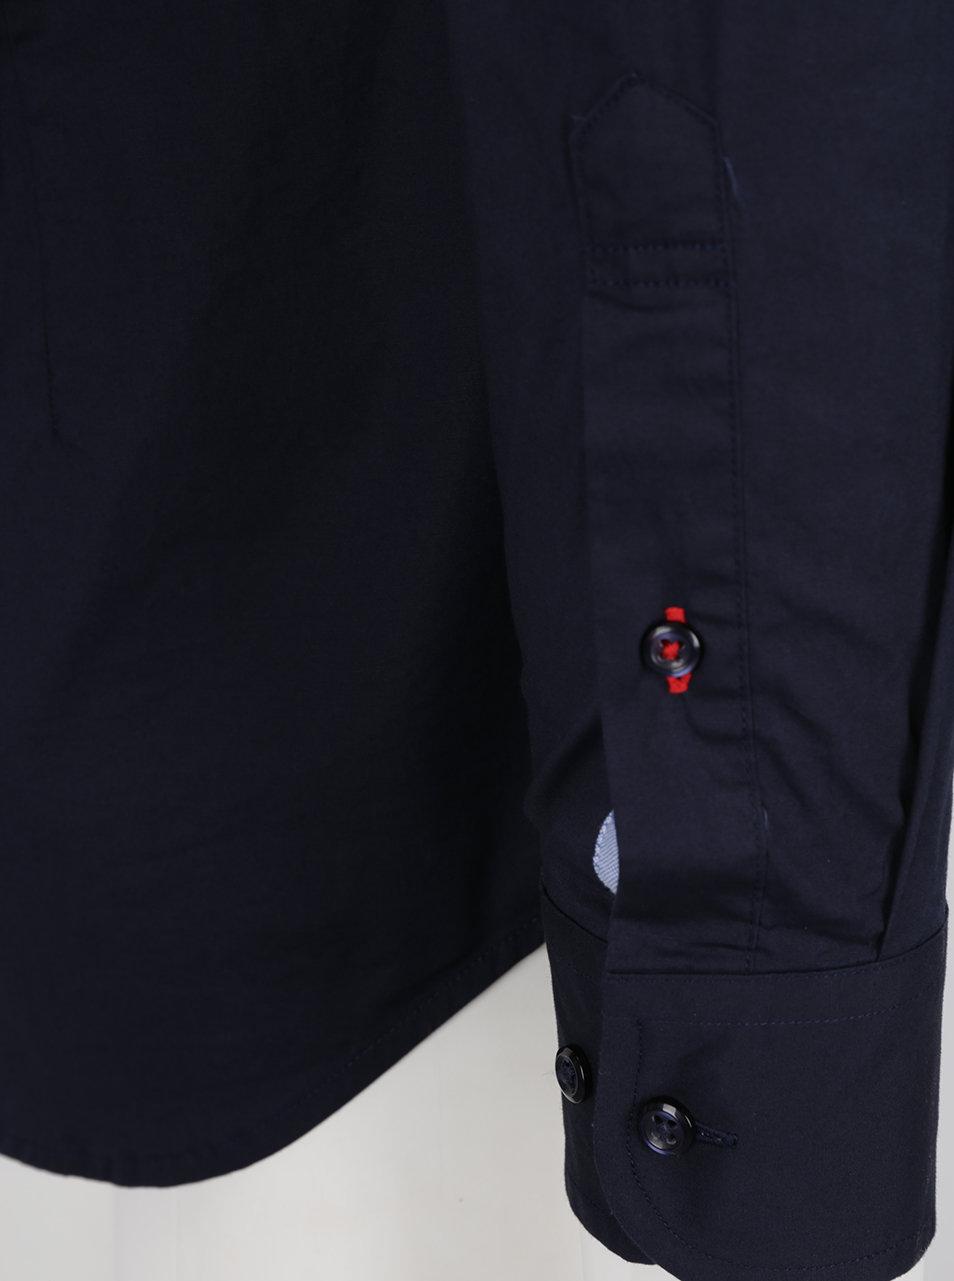 Tmavomodrá pánska formálna slim fit košeľa Tommy Hilfiger ... 5d33d4c81eb